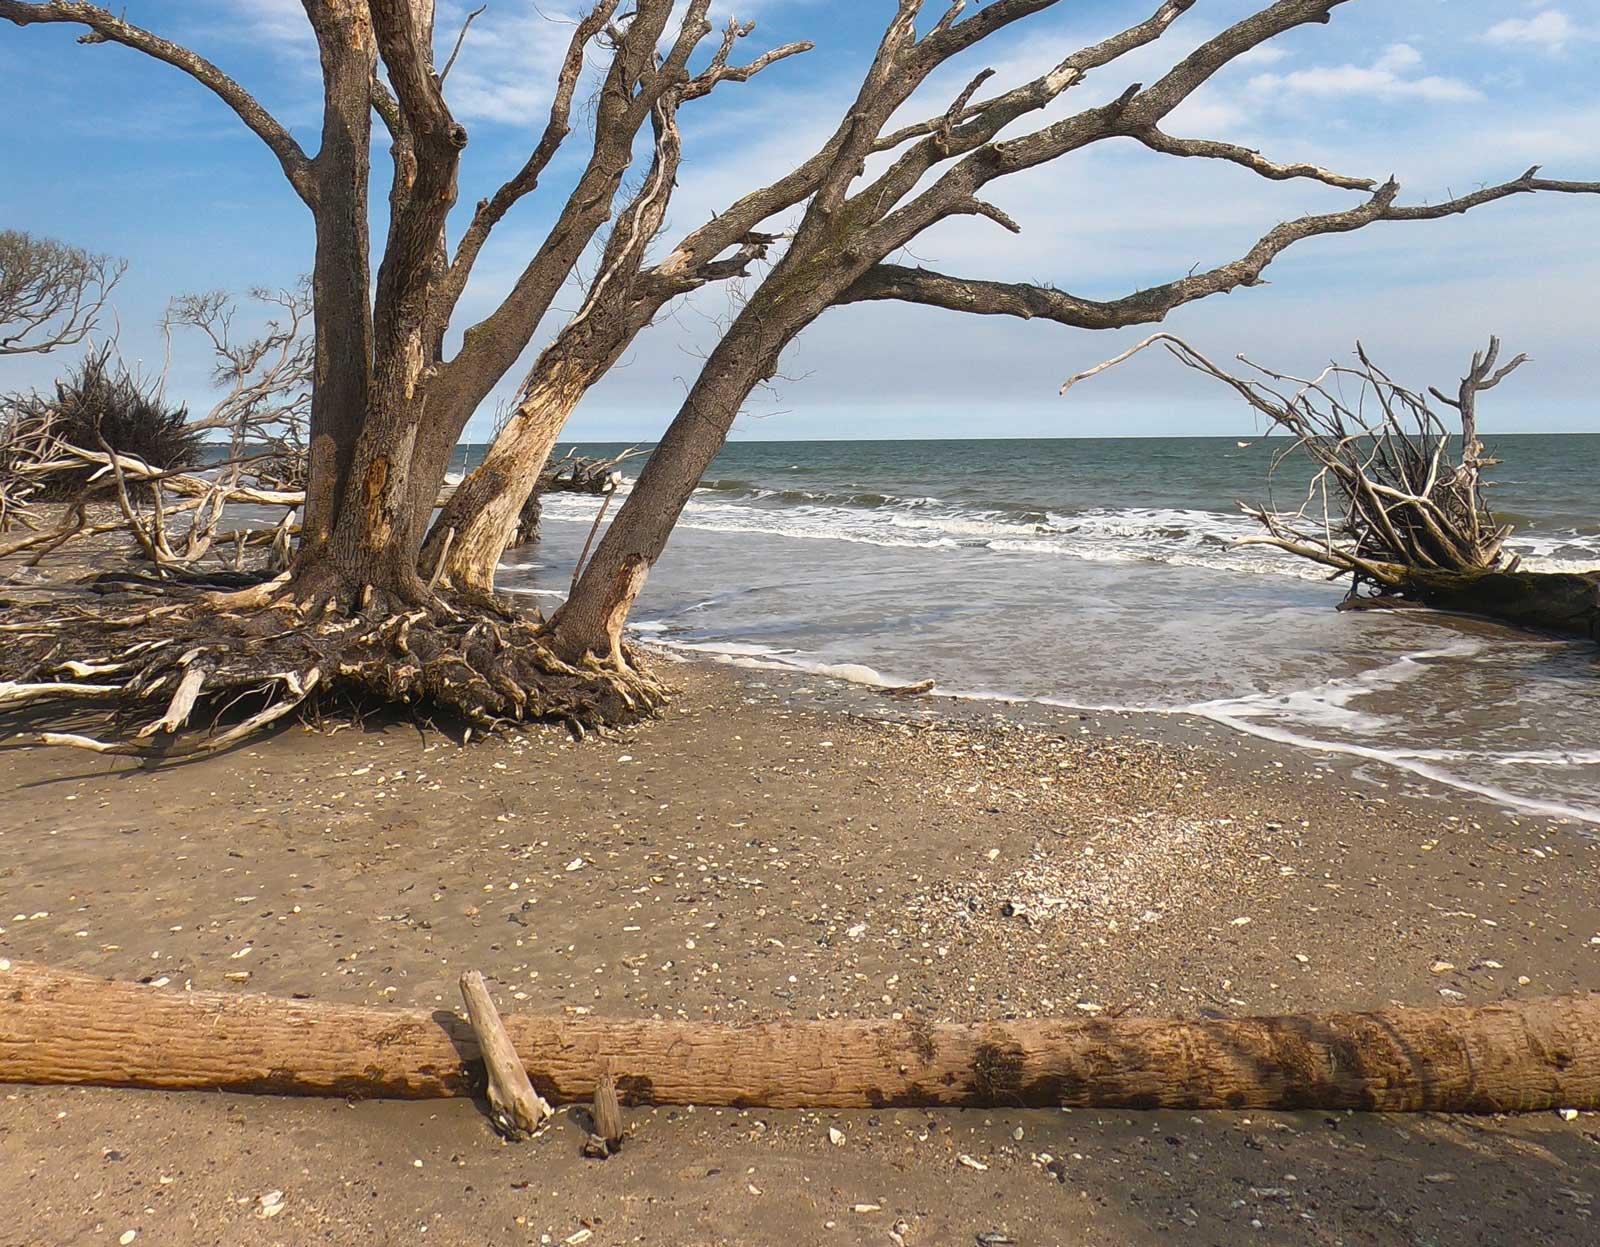 Beach boneyard at Botany Bay Plantation, Edisto Island, SC